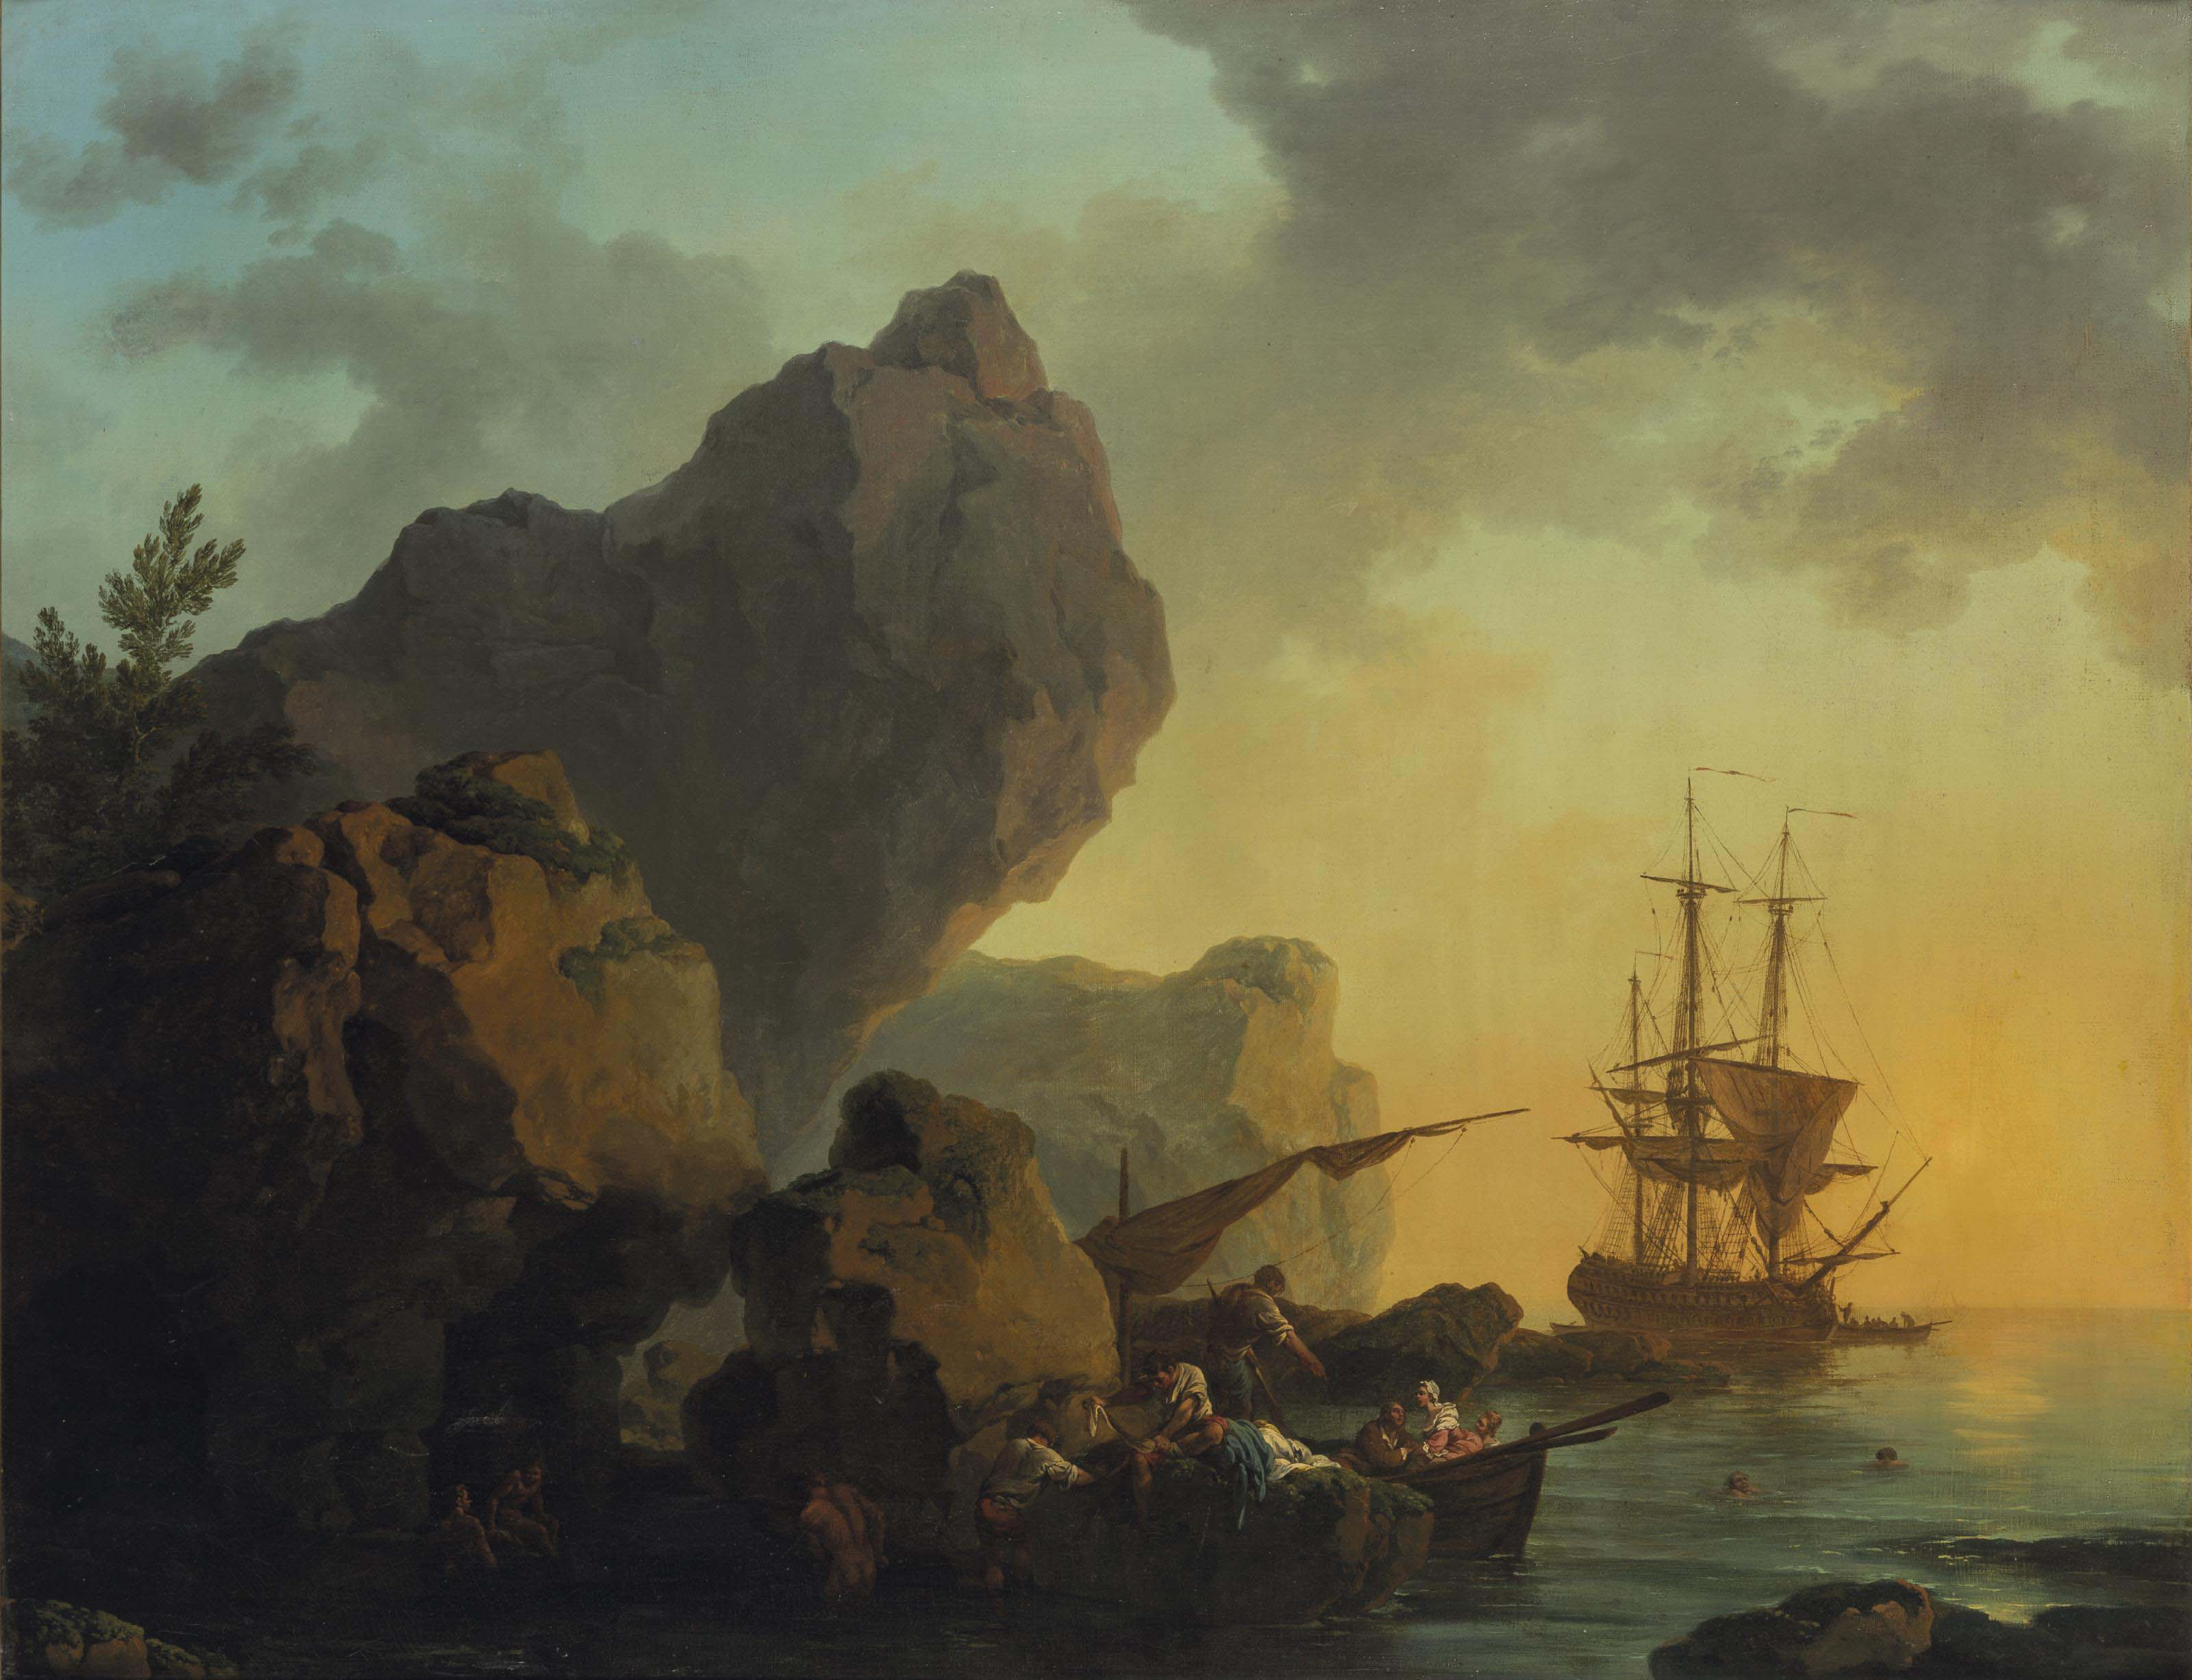 Une marine au soleil couchant